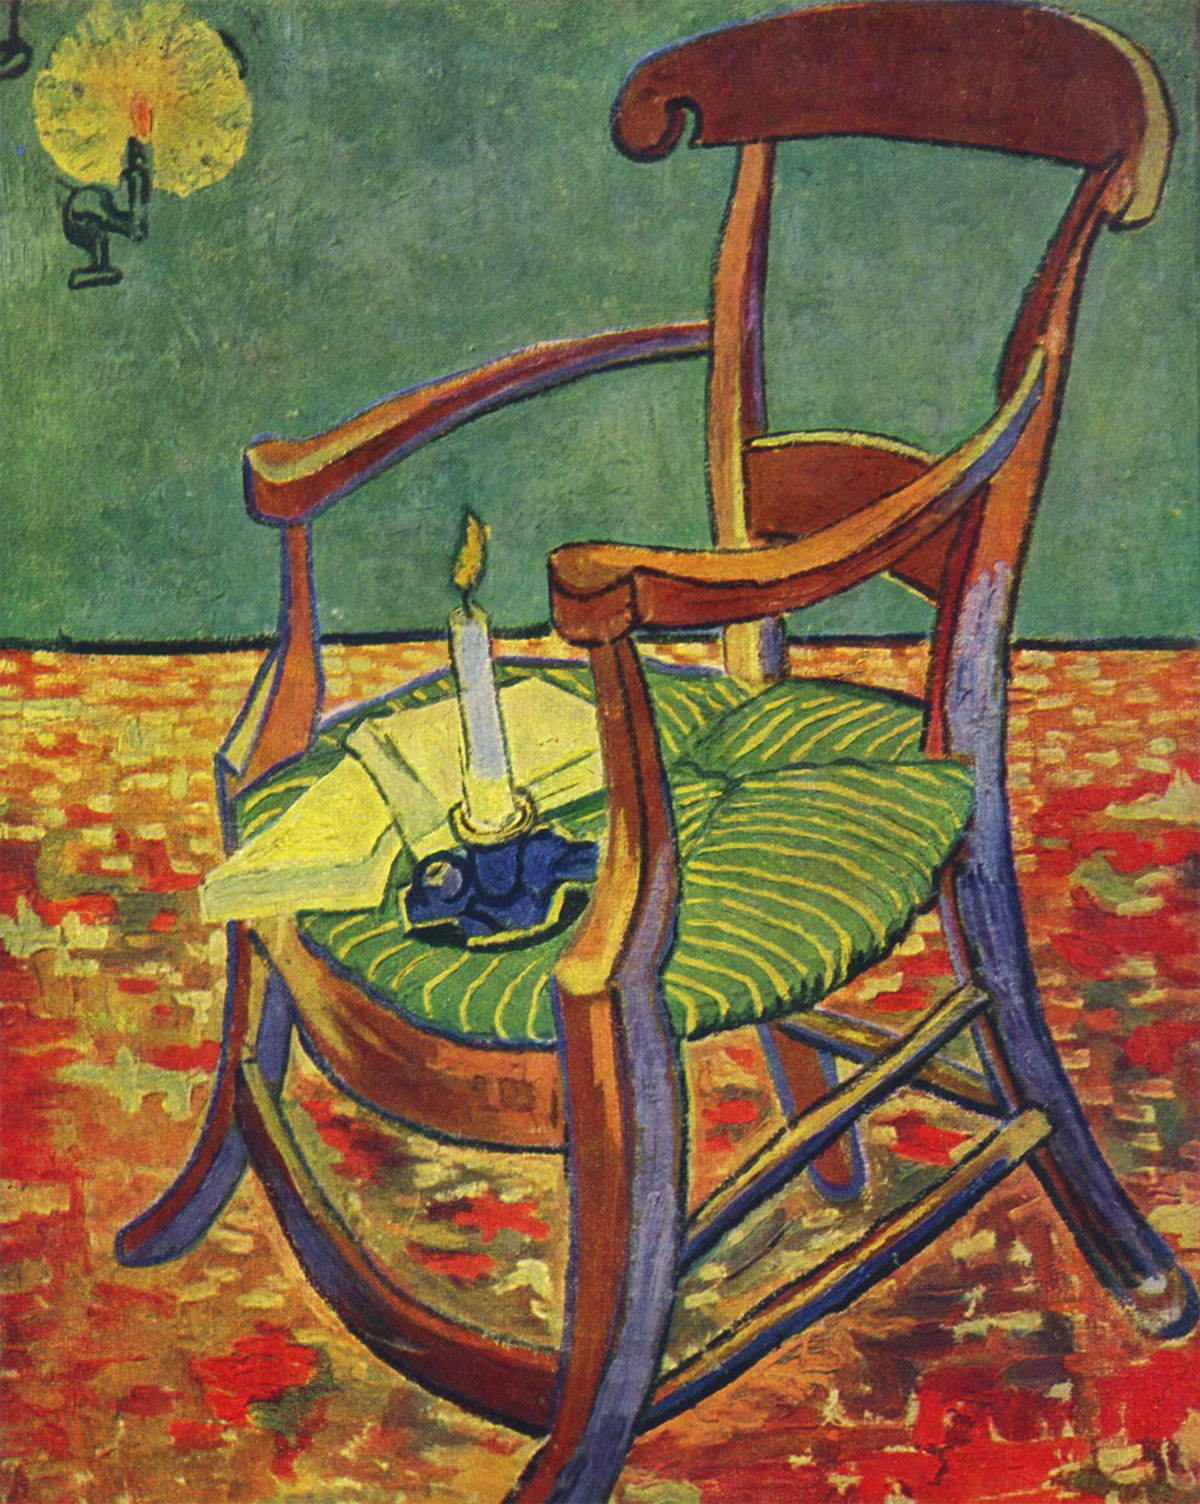 Van Gogh - La sedia di Gauguin (Gauguin's chair)